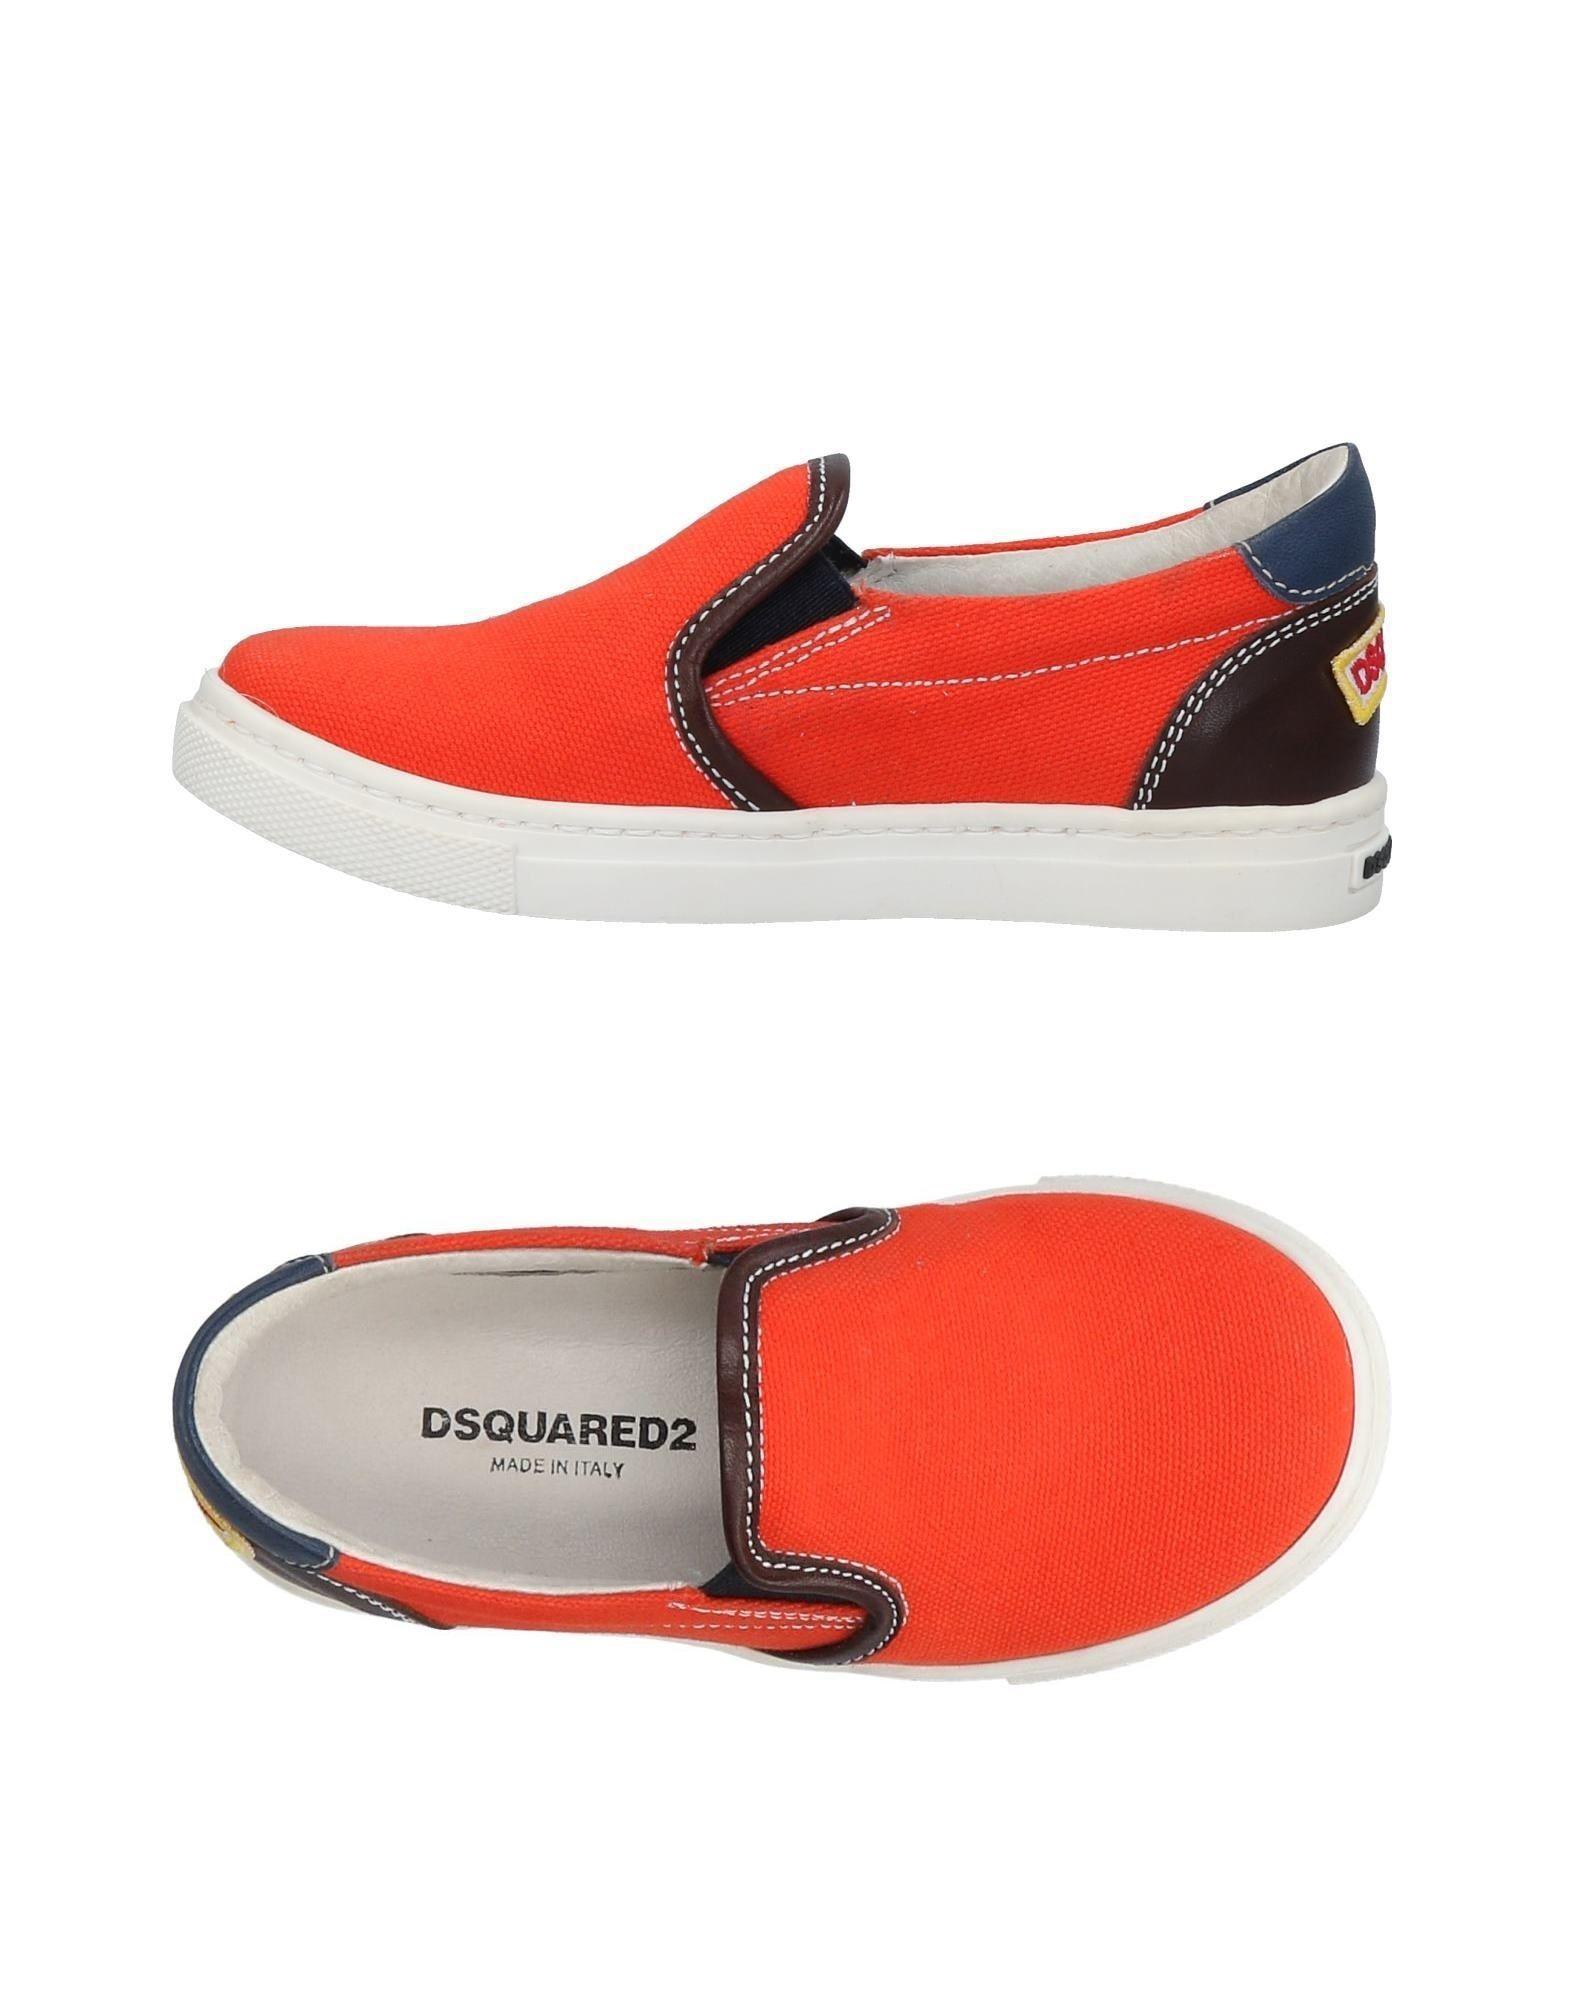 Dsquared2 In Orange